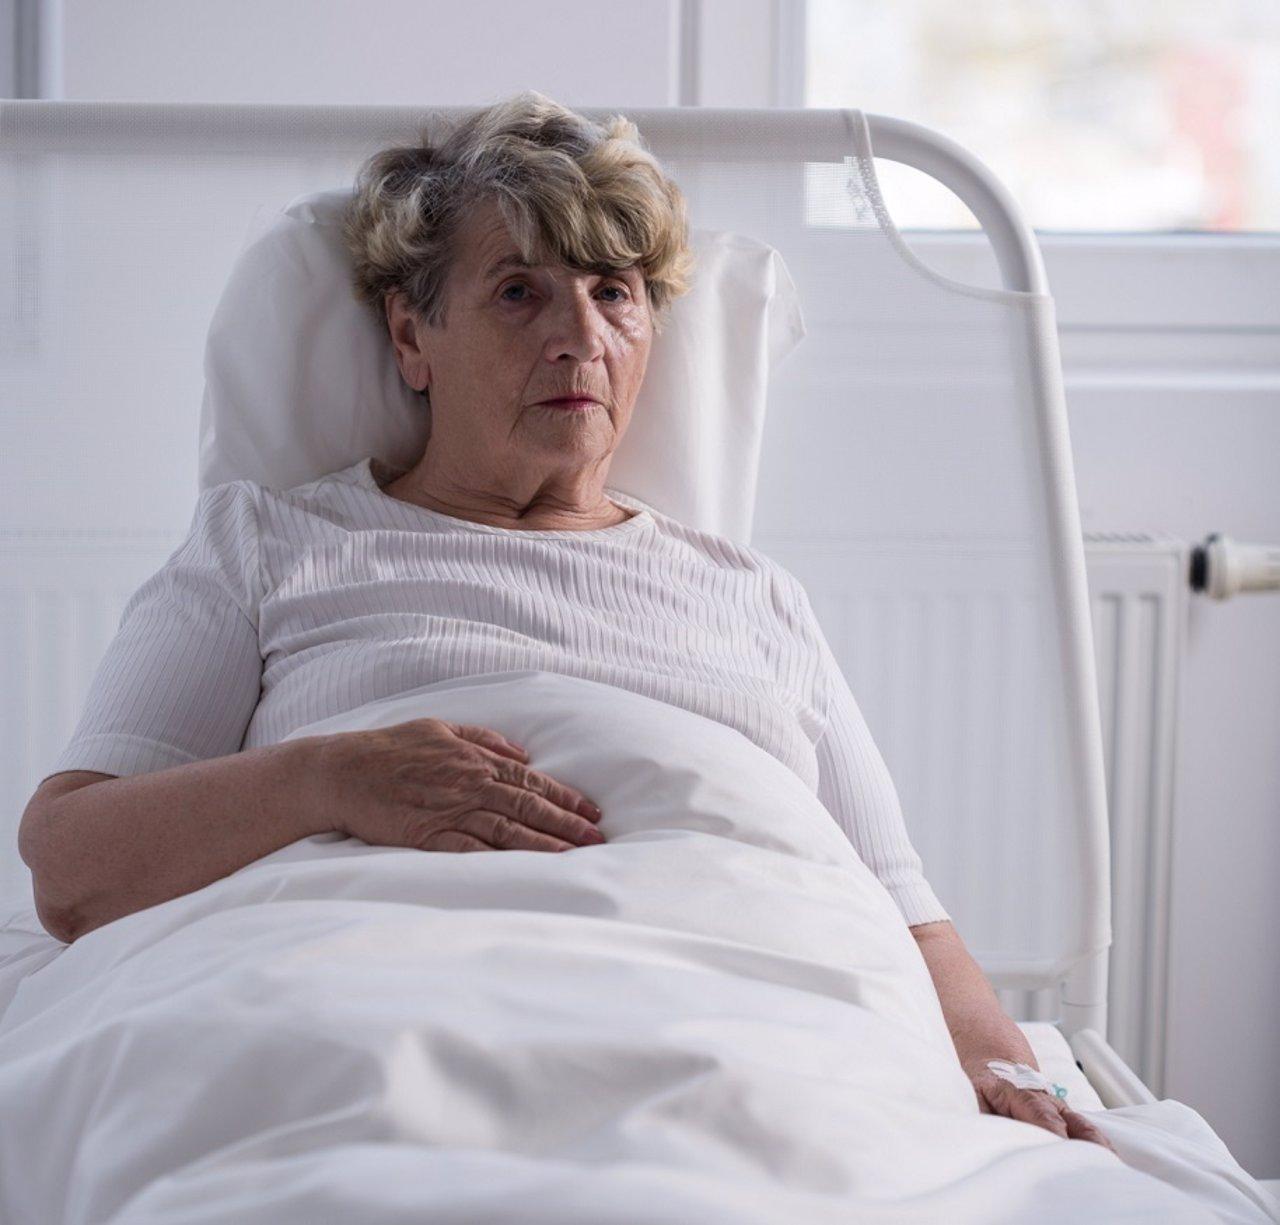 Señora, cama, hospital, catatonia, enferma